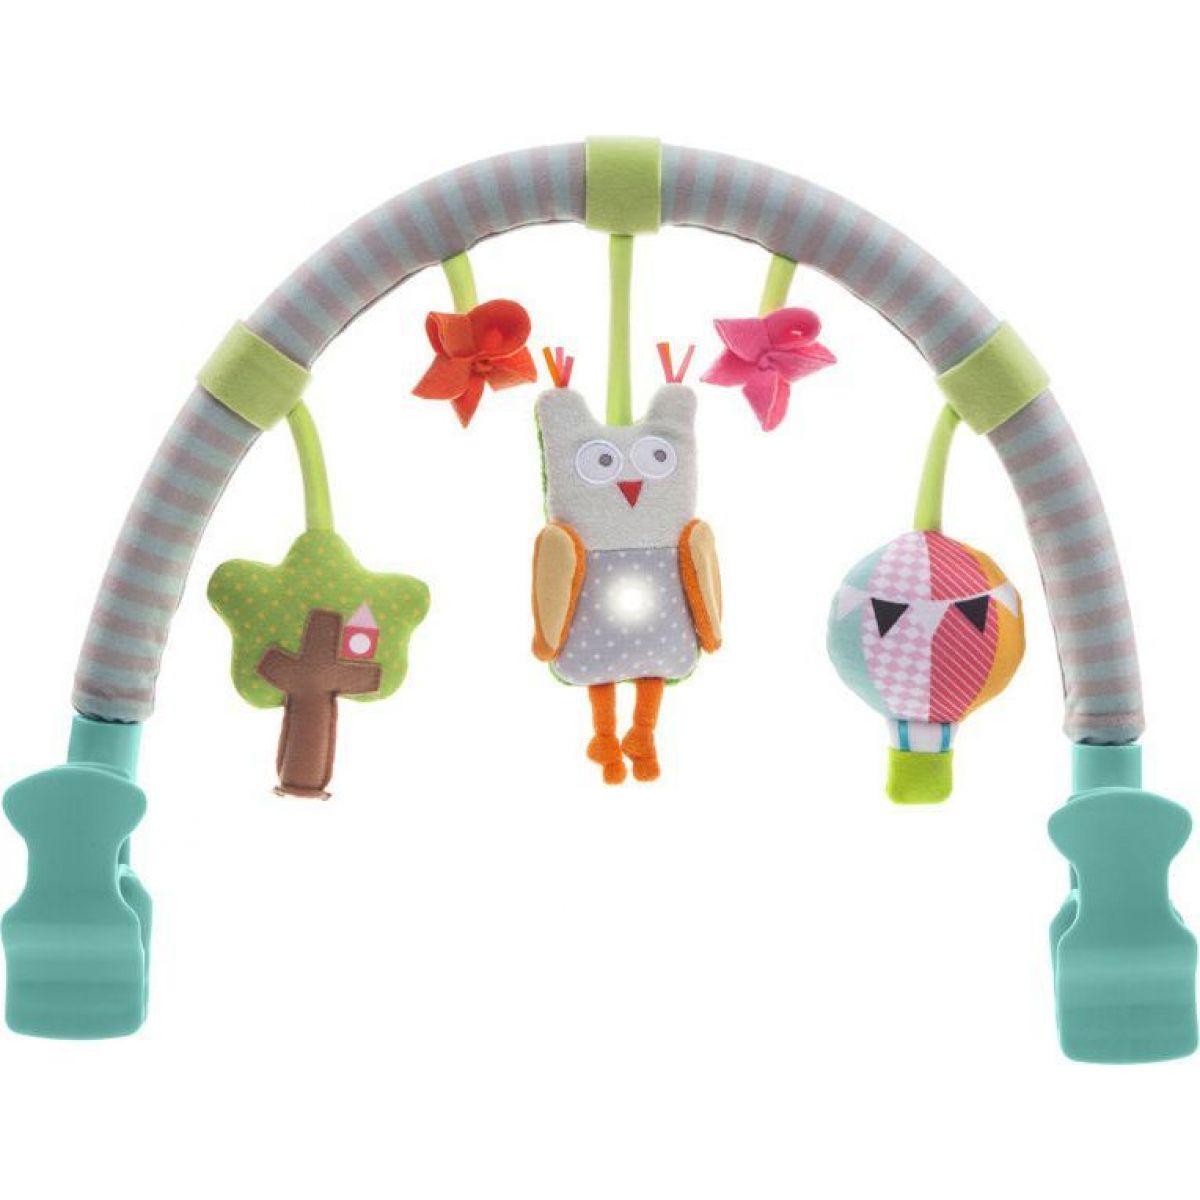 Taf Toys Hudobný pultík do auta Sova